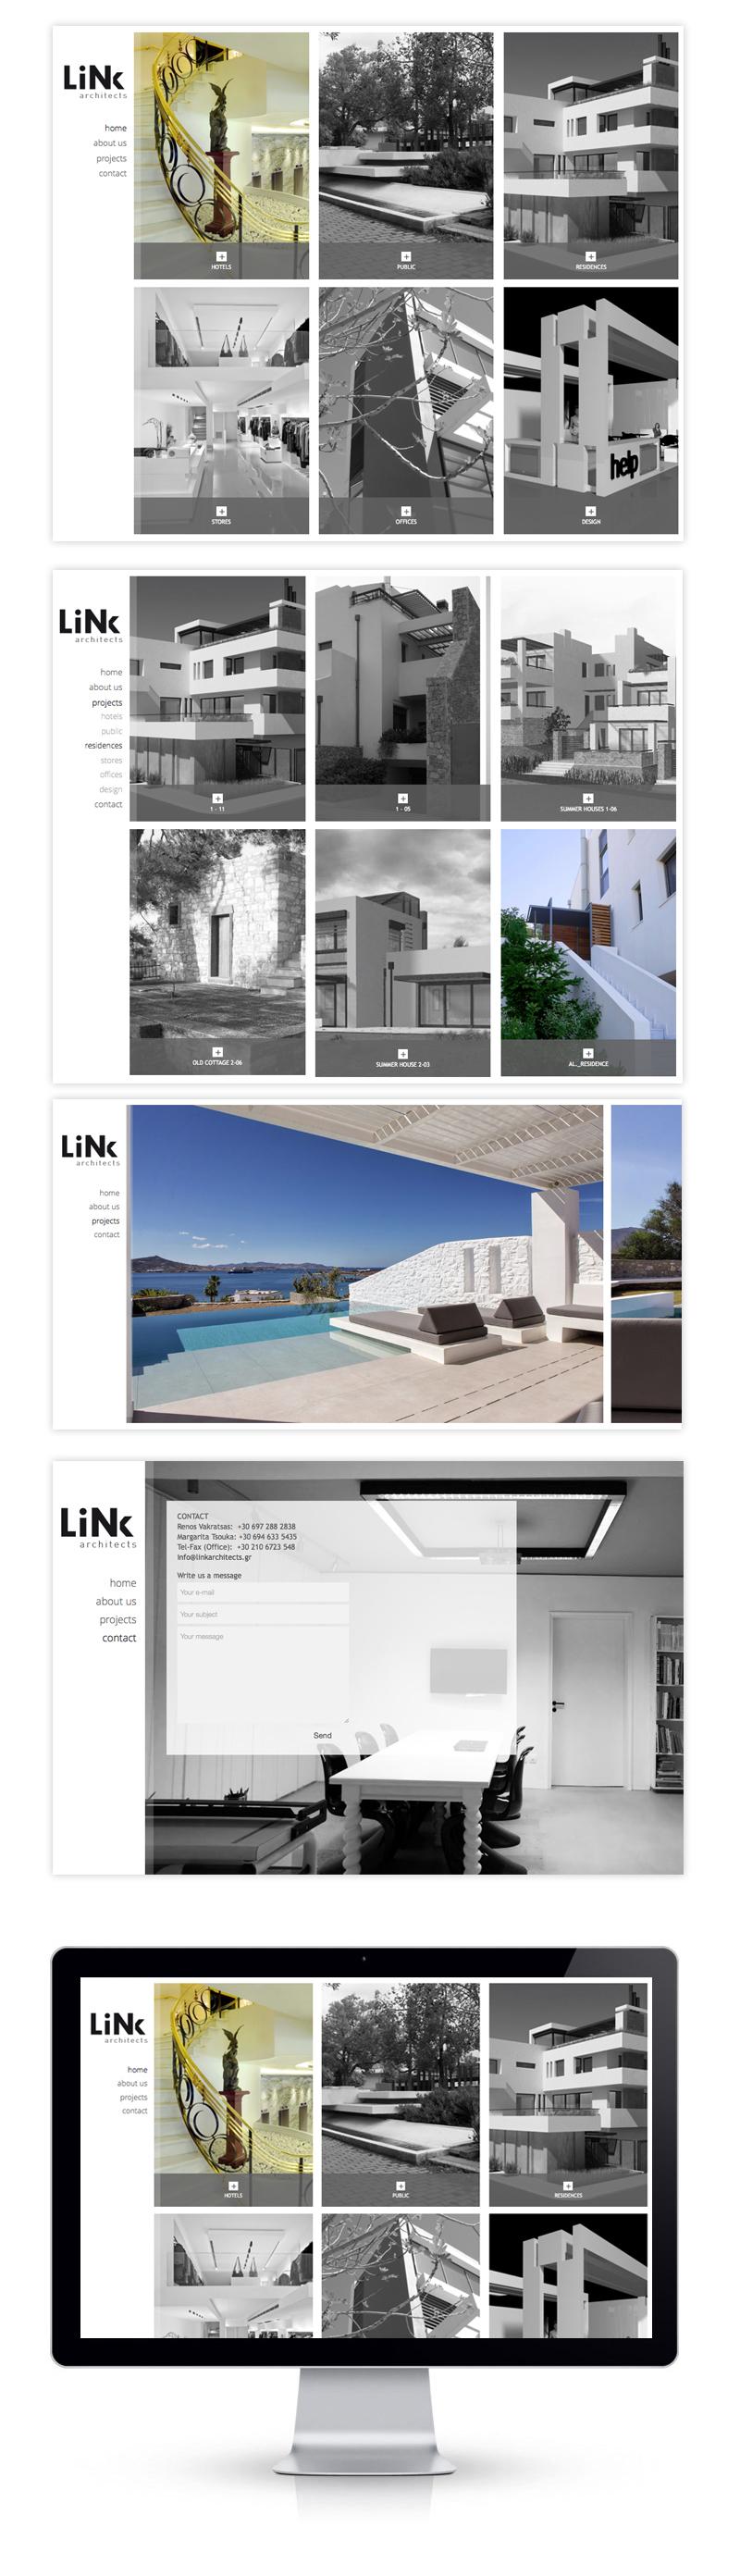 Link_SITE